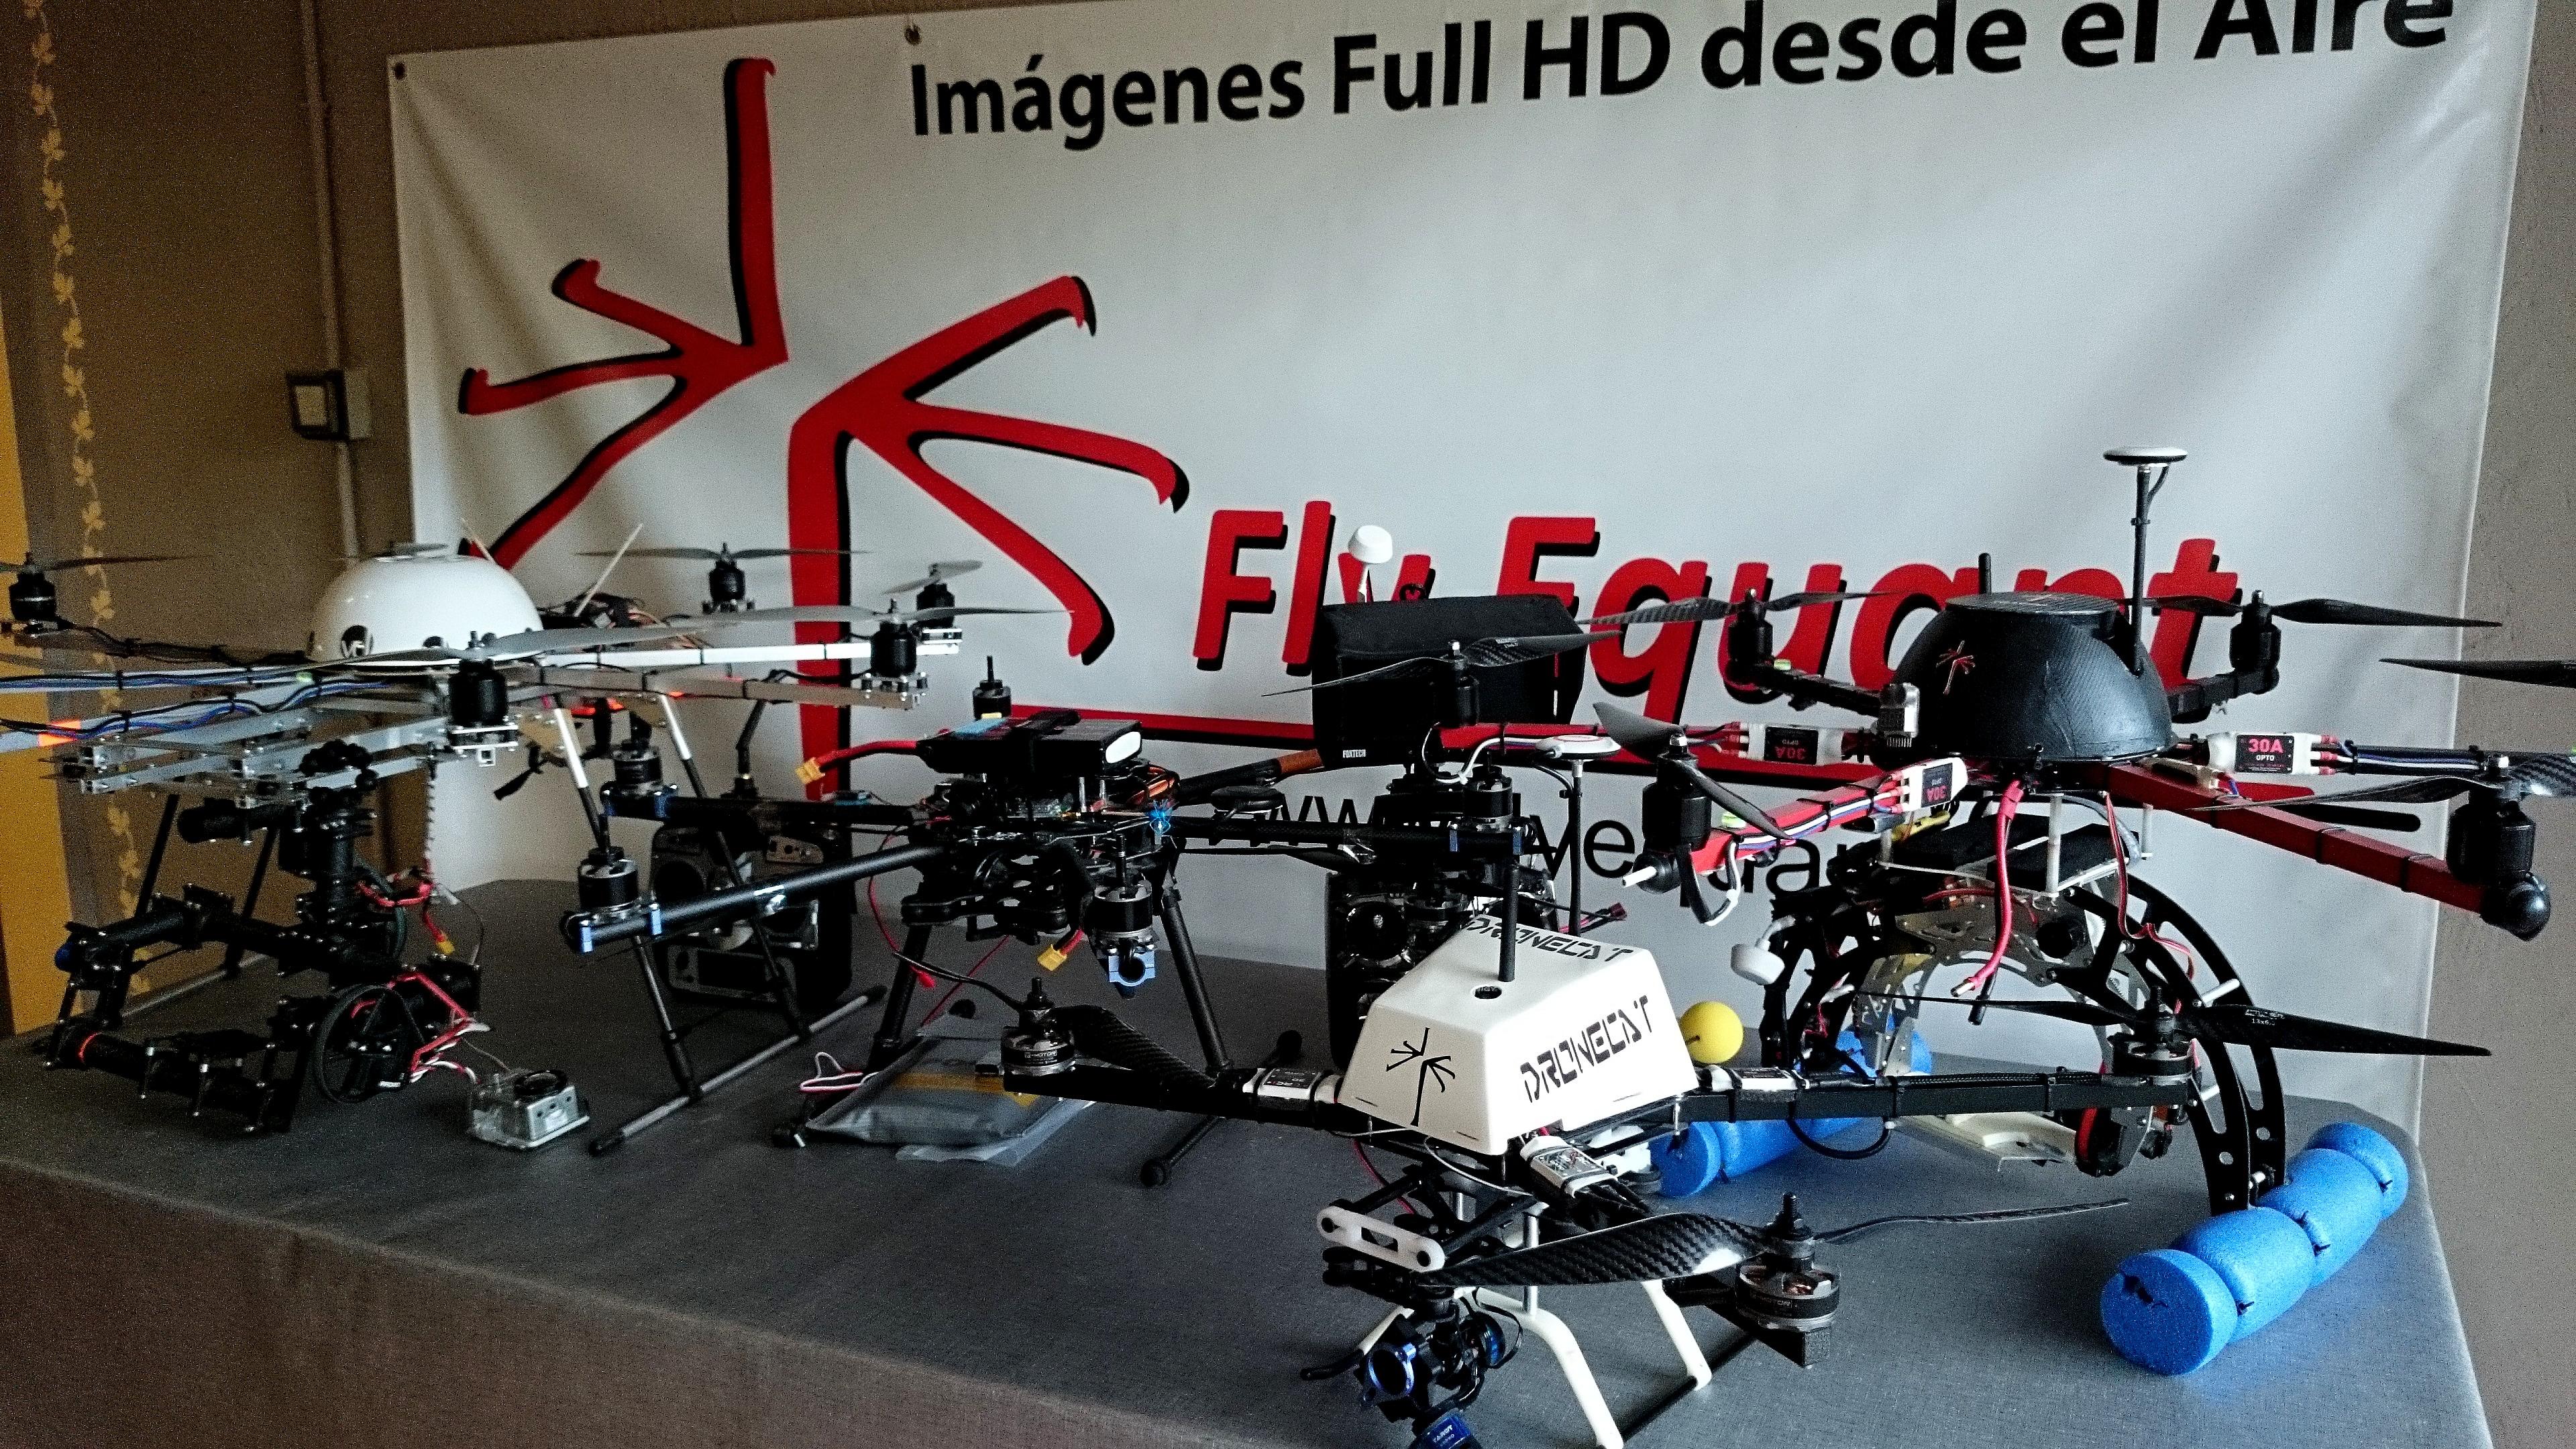 Familia flyequant 1